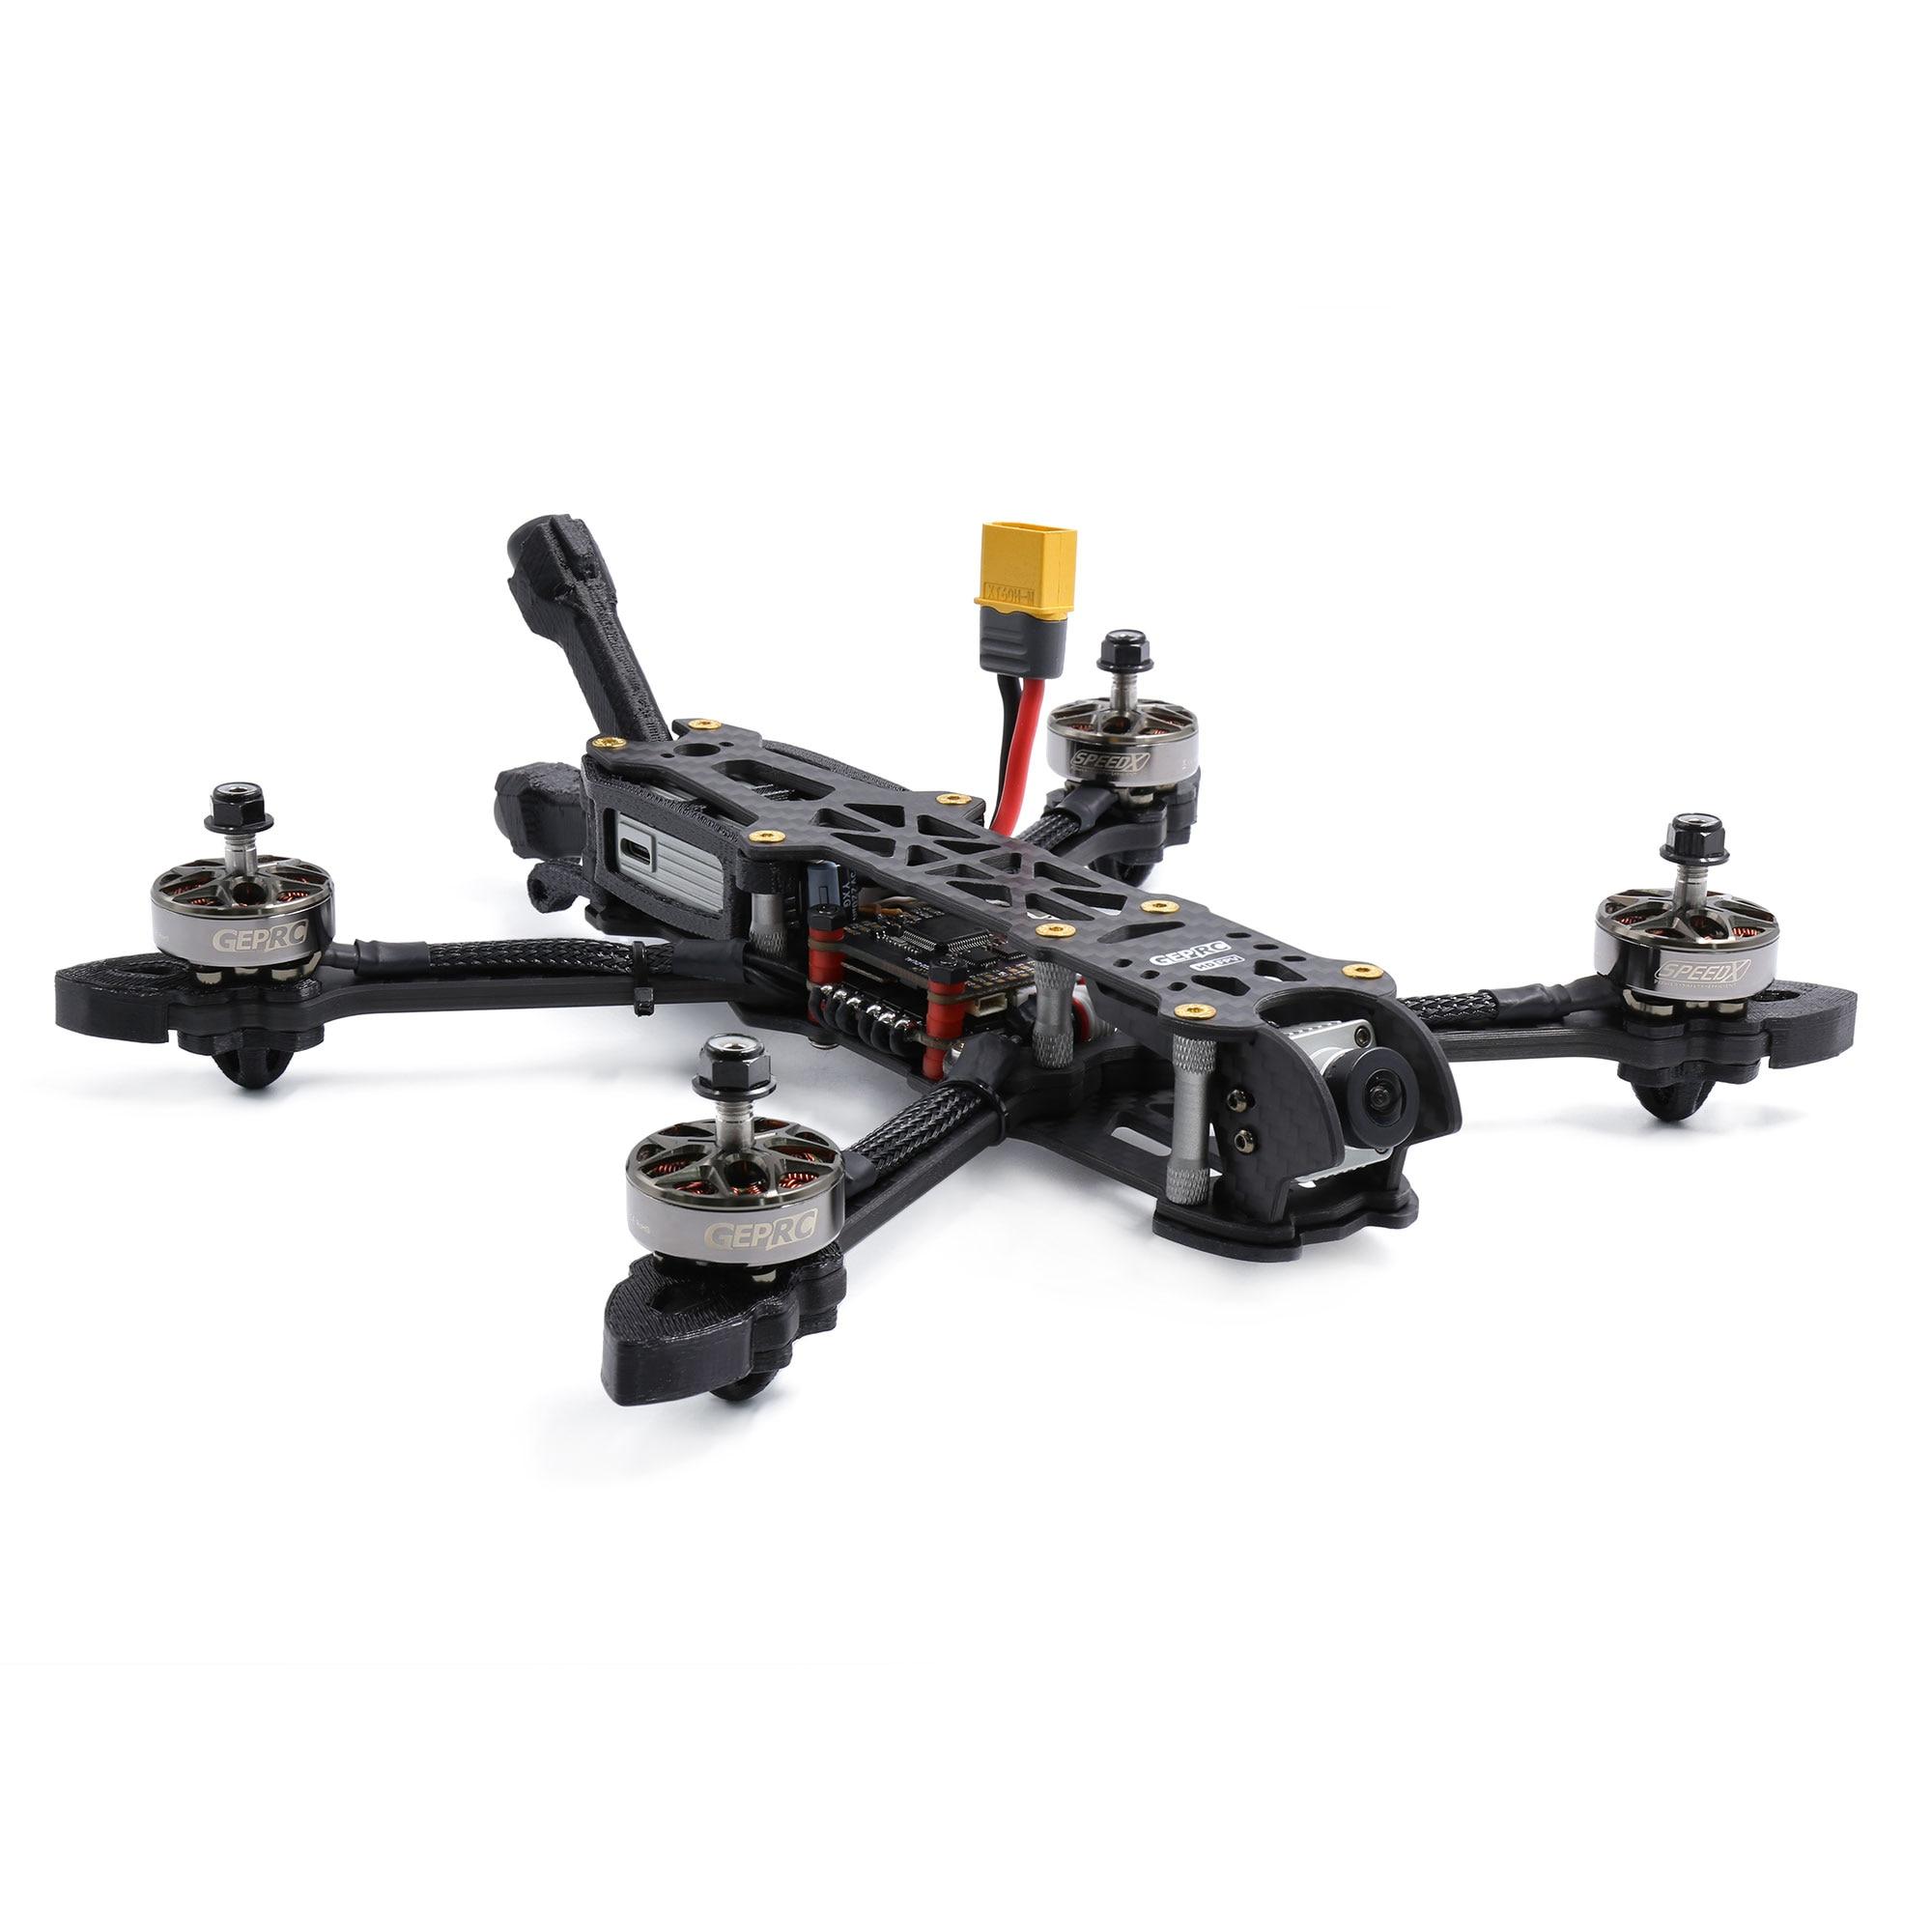 GEPRC Mark4 HD5 SPAN-F7-BT BLHeli_32 50A FPV الهواء وحدة GR2306.5 2450KV 4S 1850KV 6S 224 مللي متر 5 بوصة FPV سباق حرة Drone